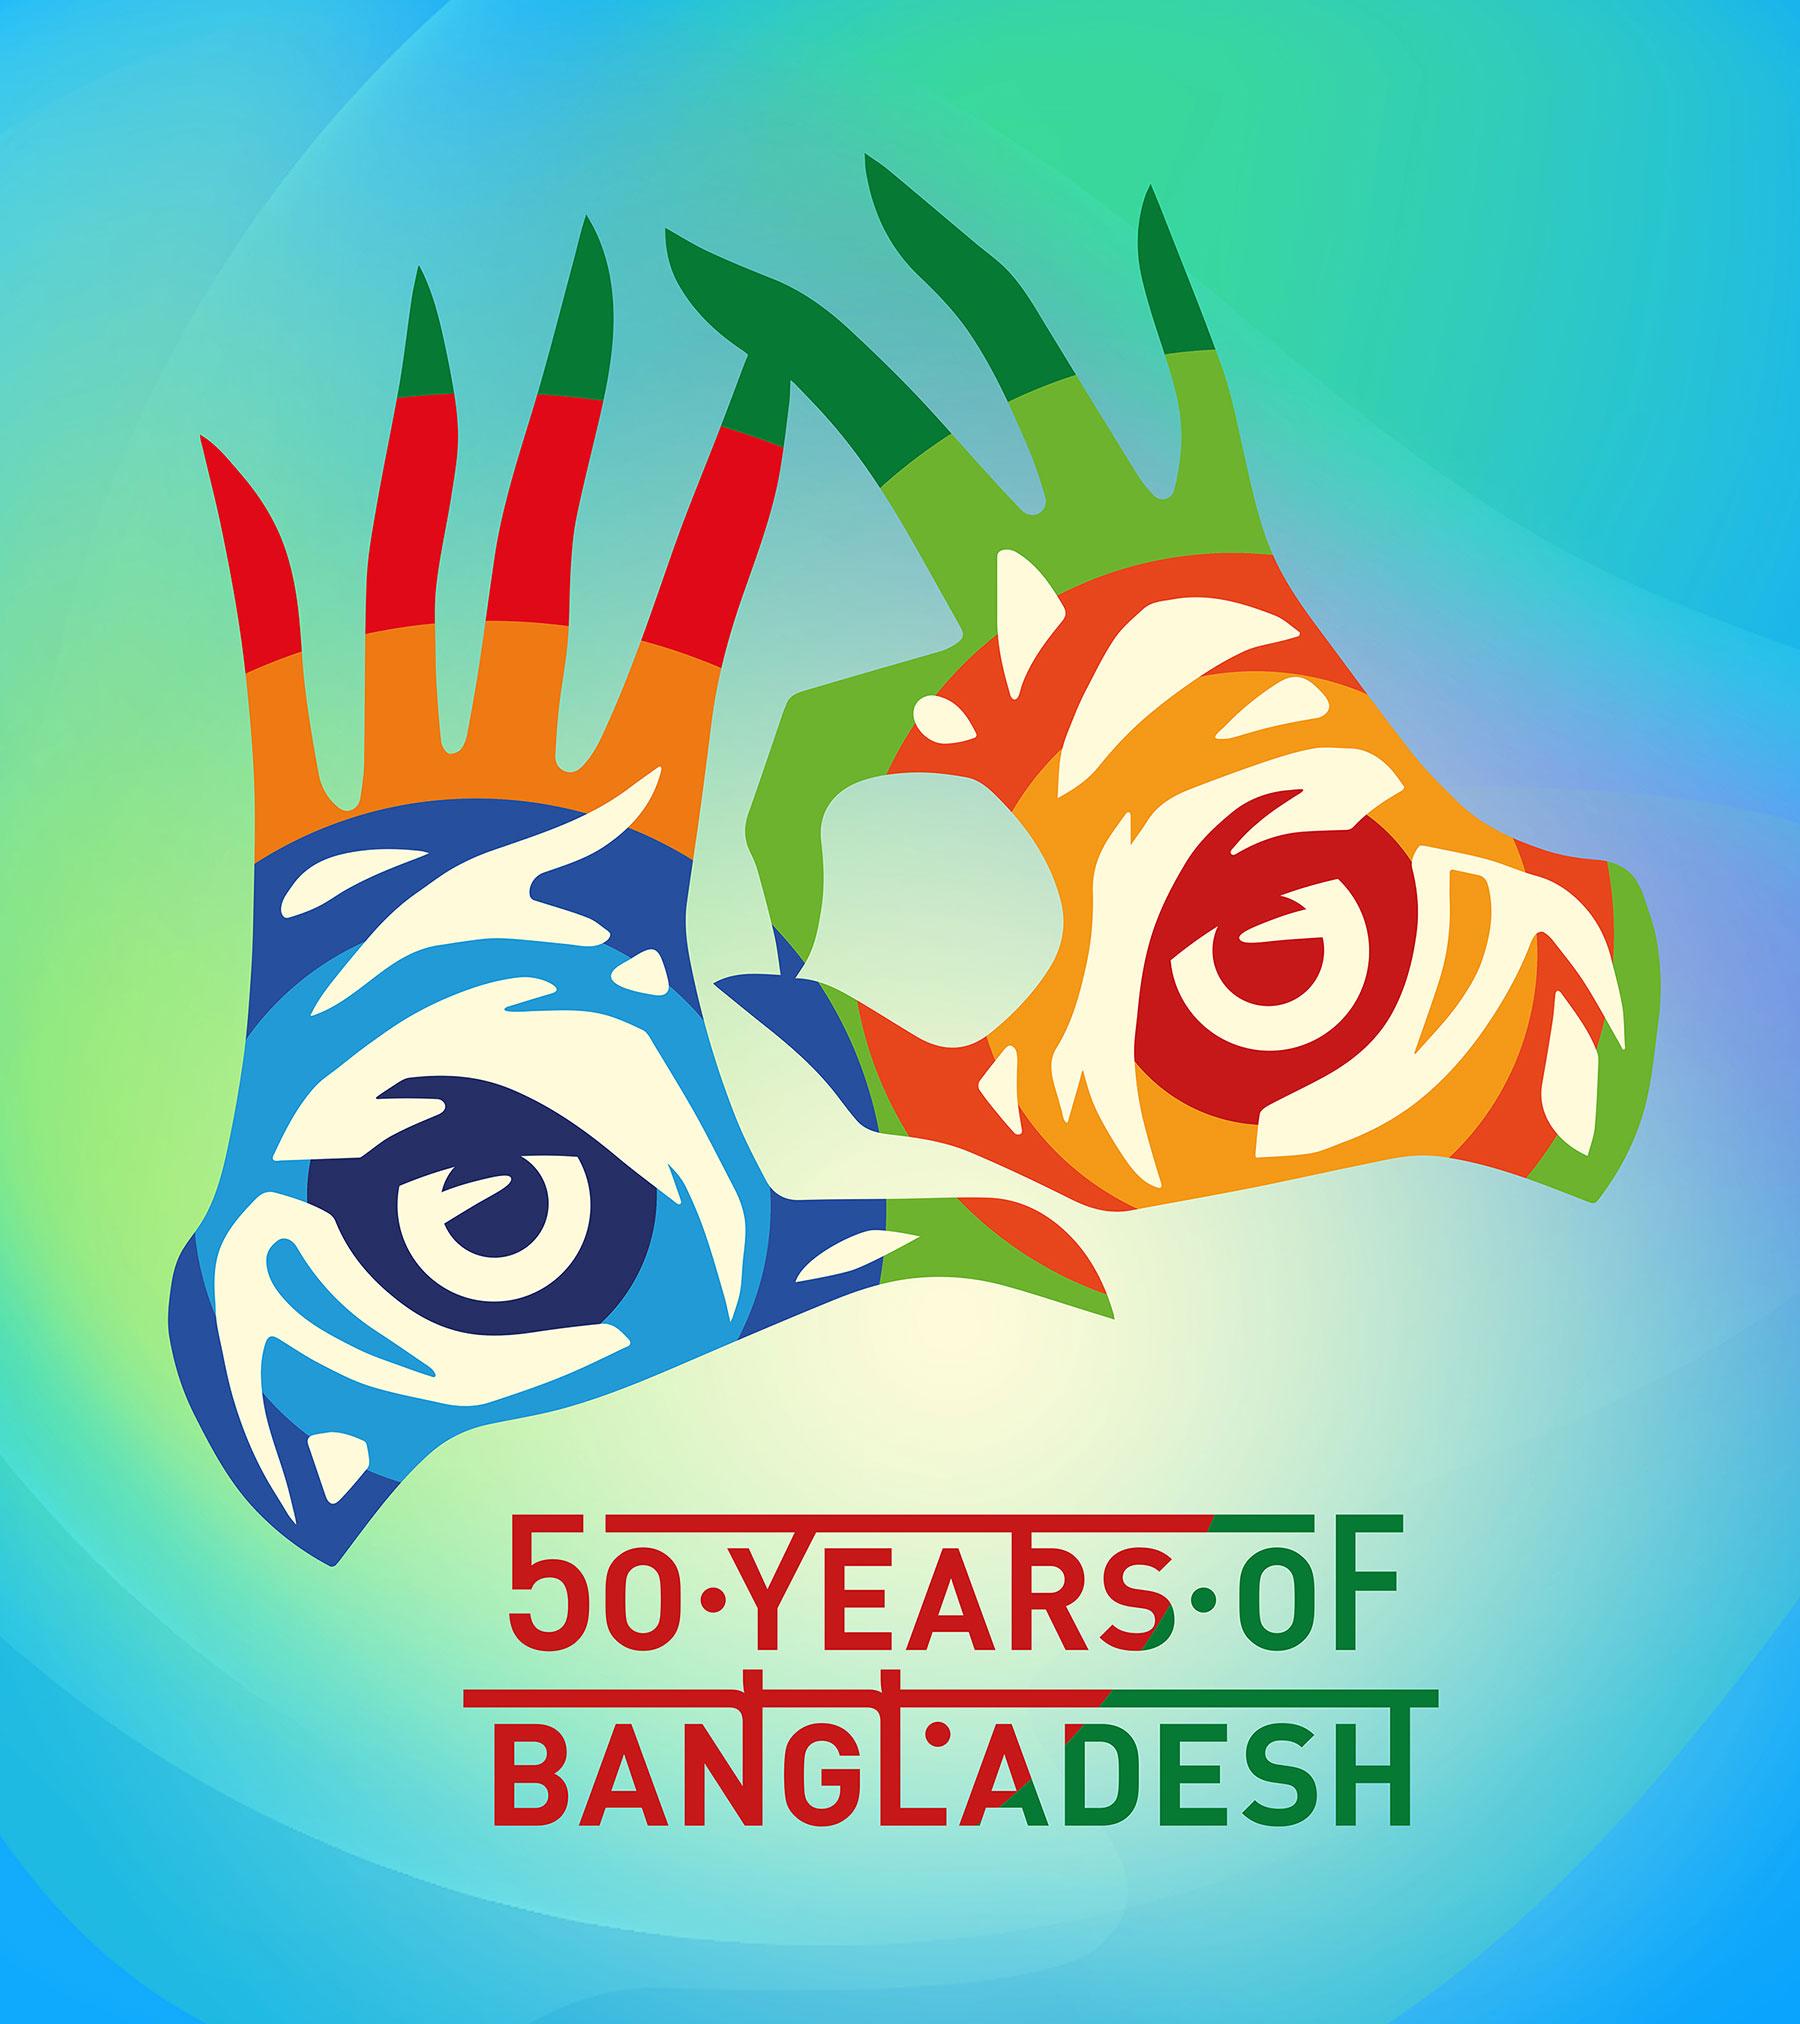 trommer 50 years of bangladesh logo on green